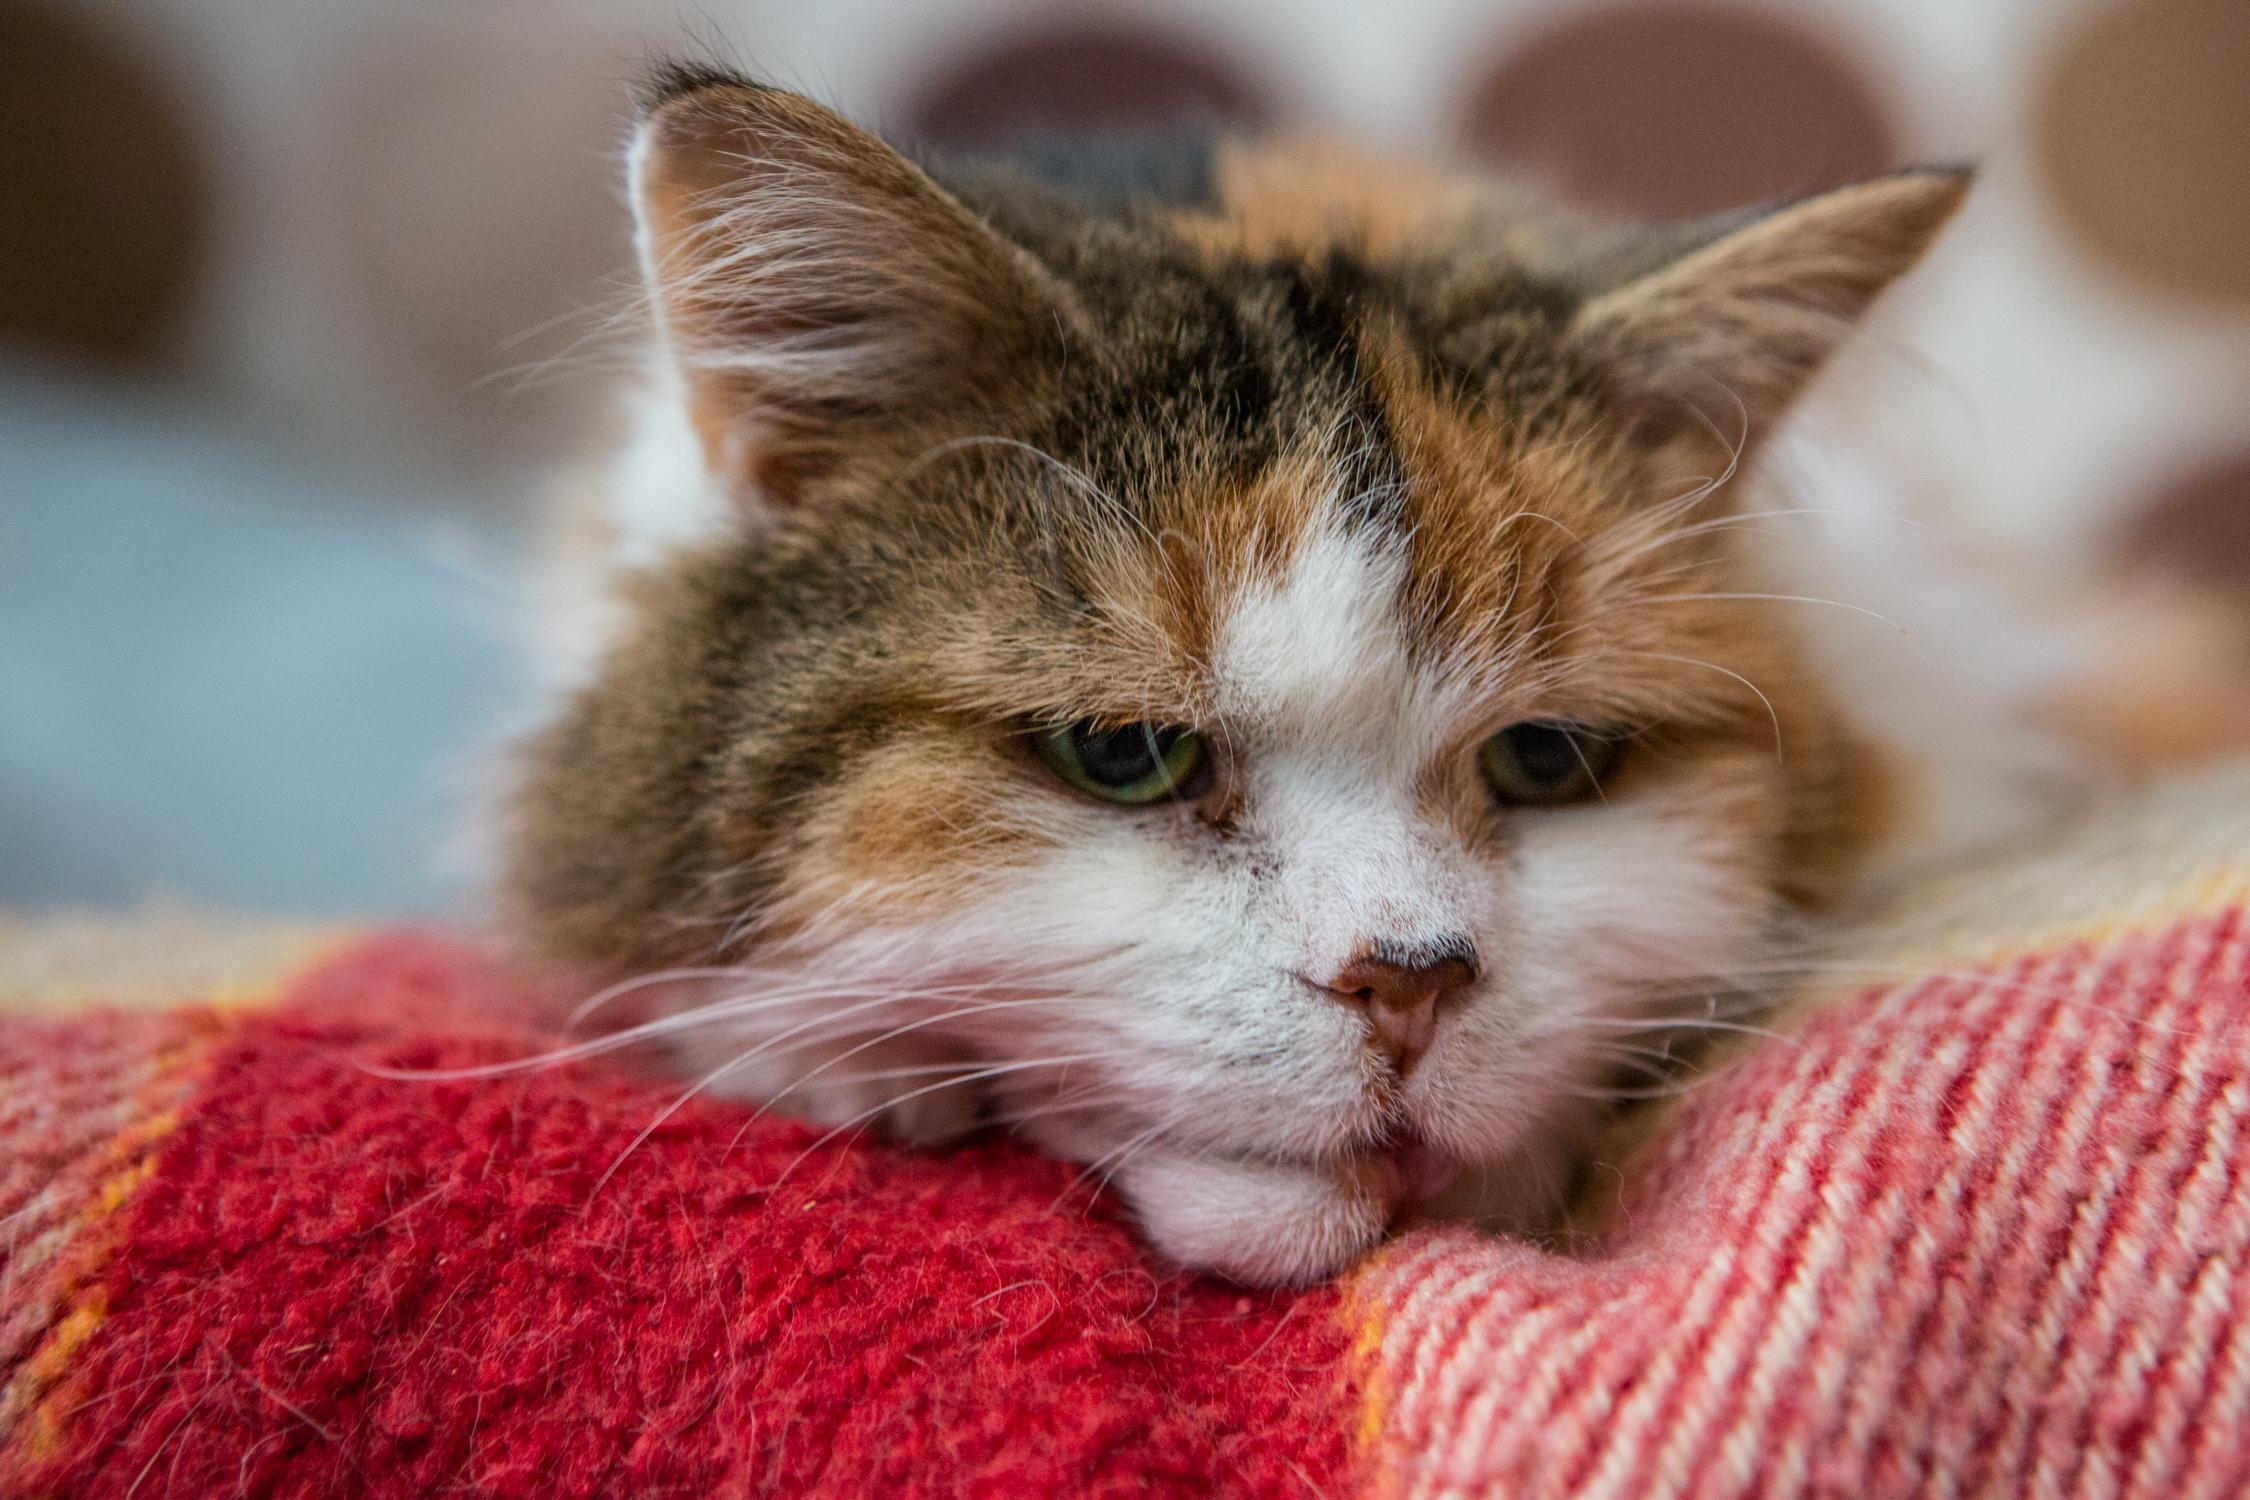 KW_Cats1_036.jpg